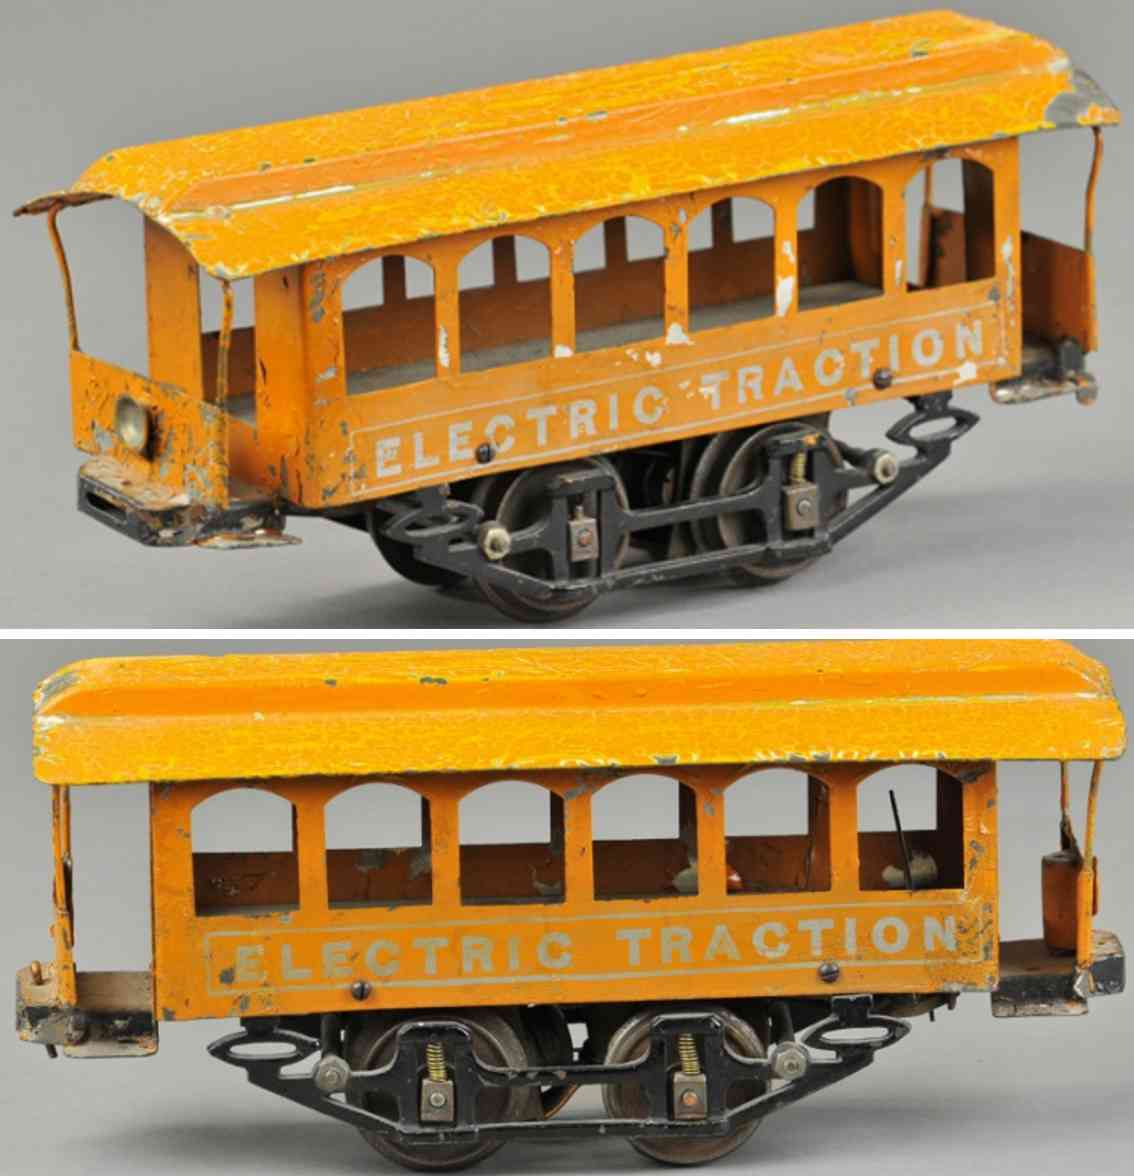 knapp electric and novelty company 4 strassenbahn  orange 2 inches